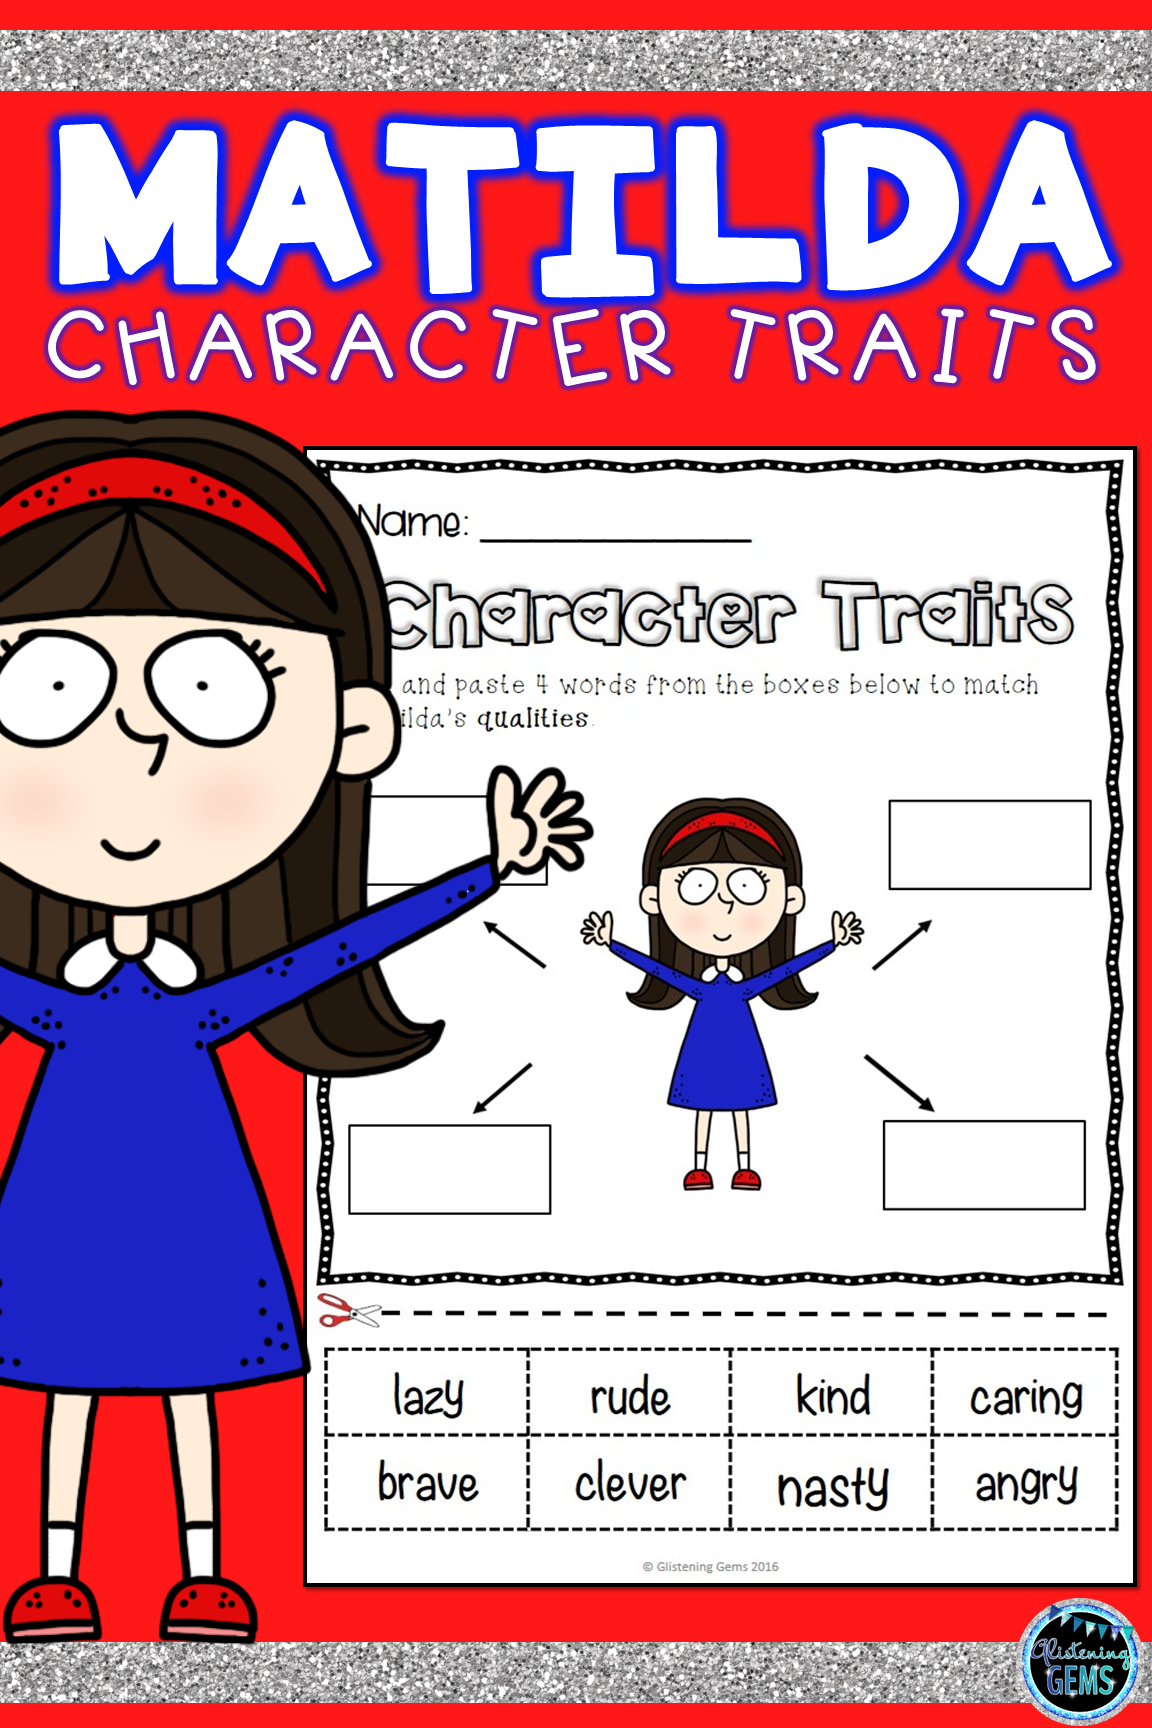 Matilda Character Traits Activities Bundle